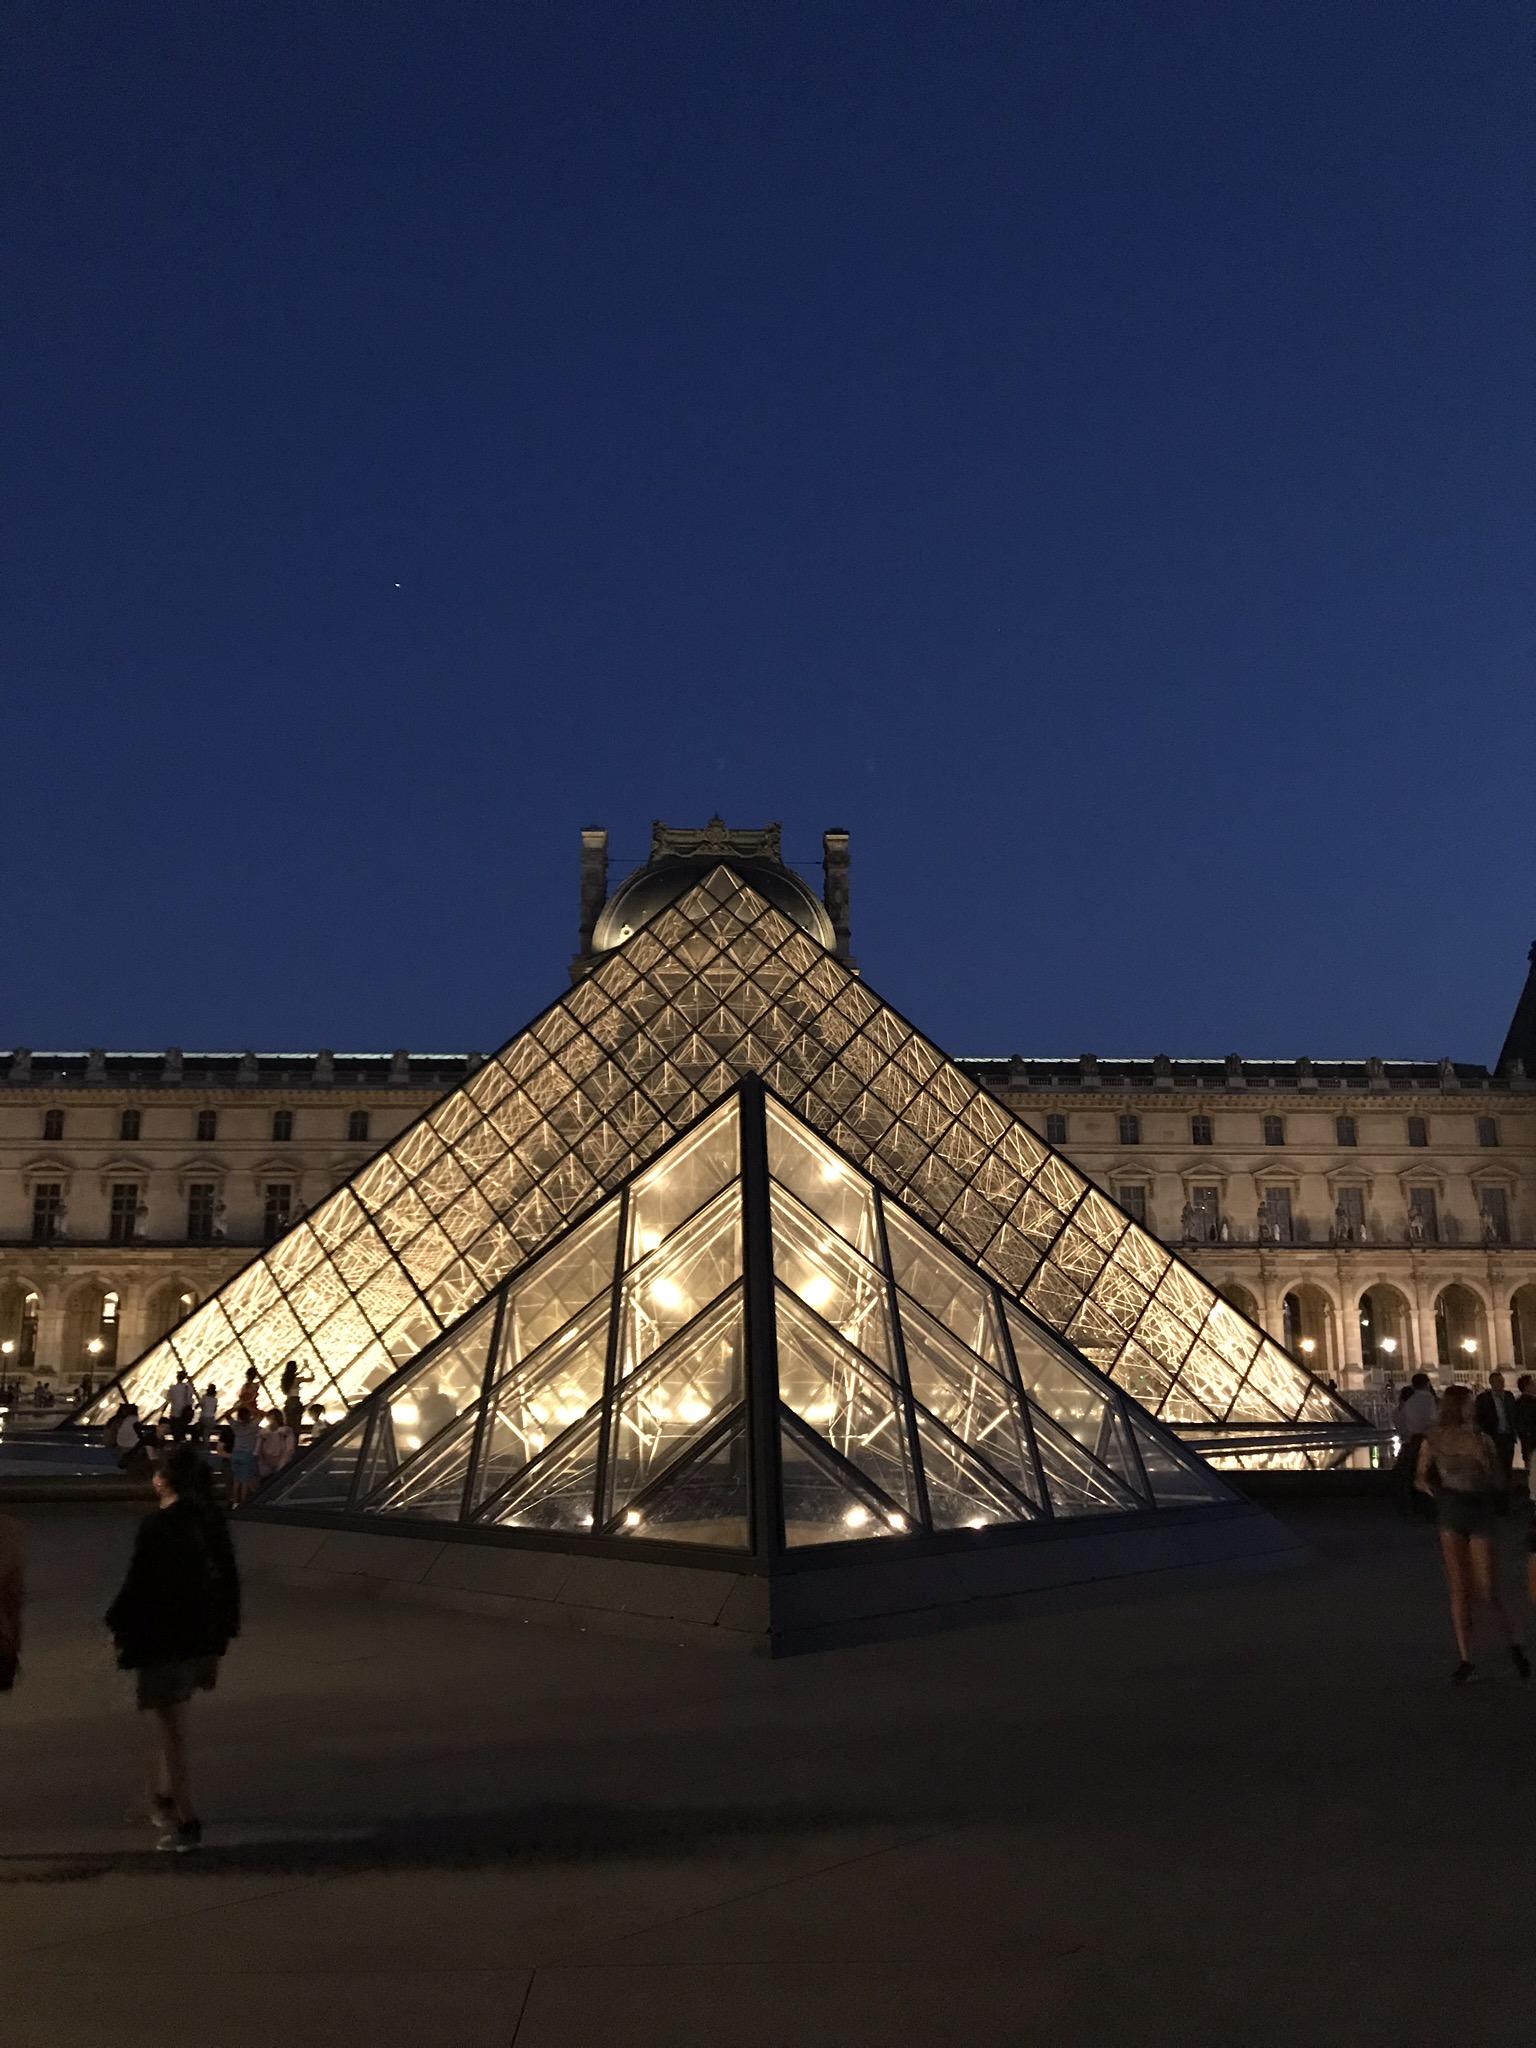 A Pyramid!